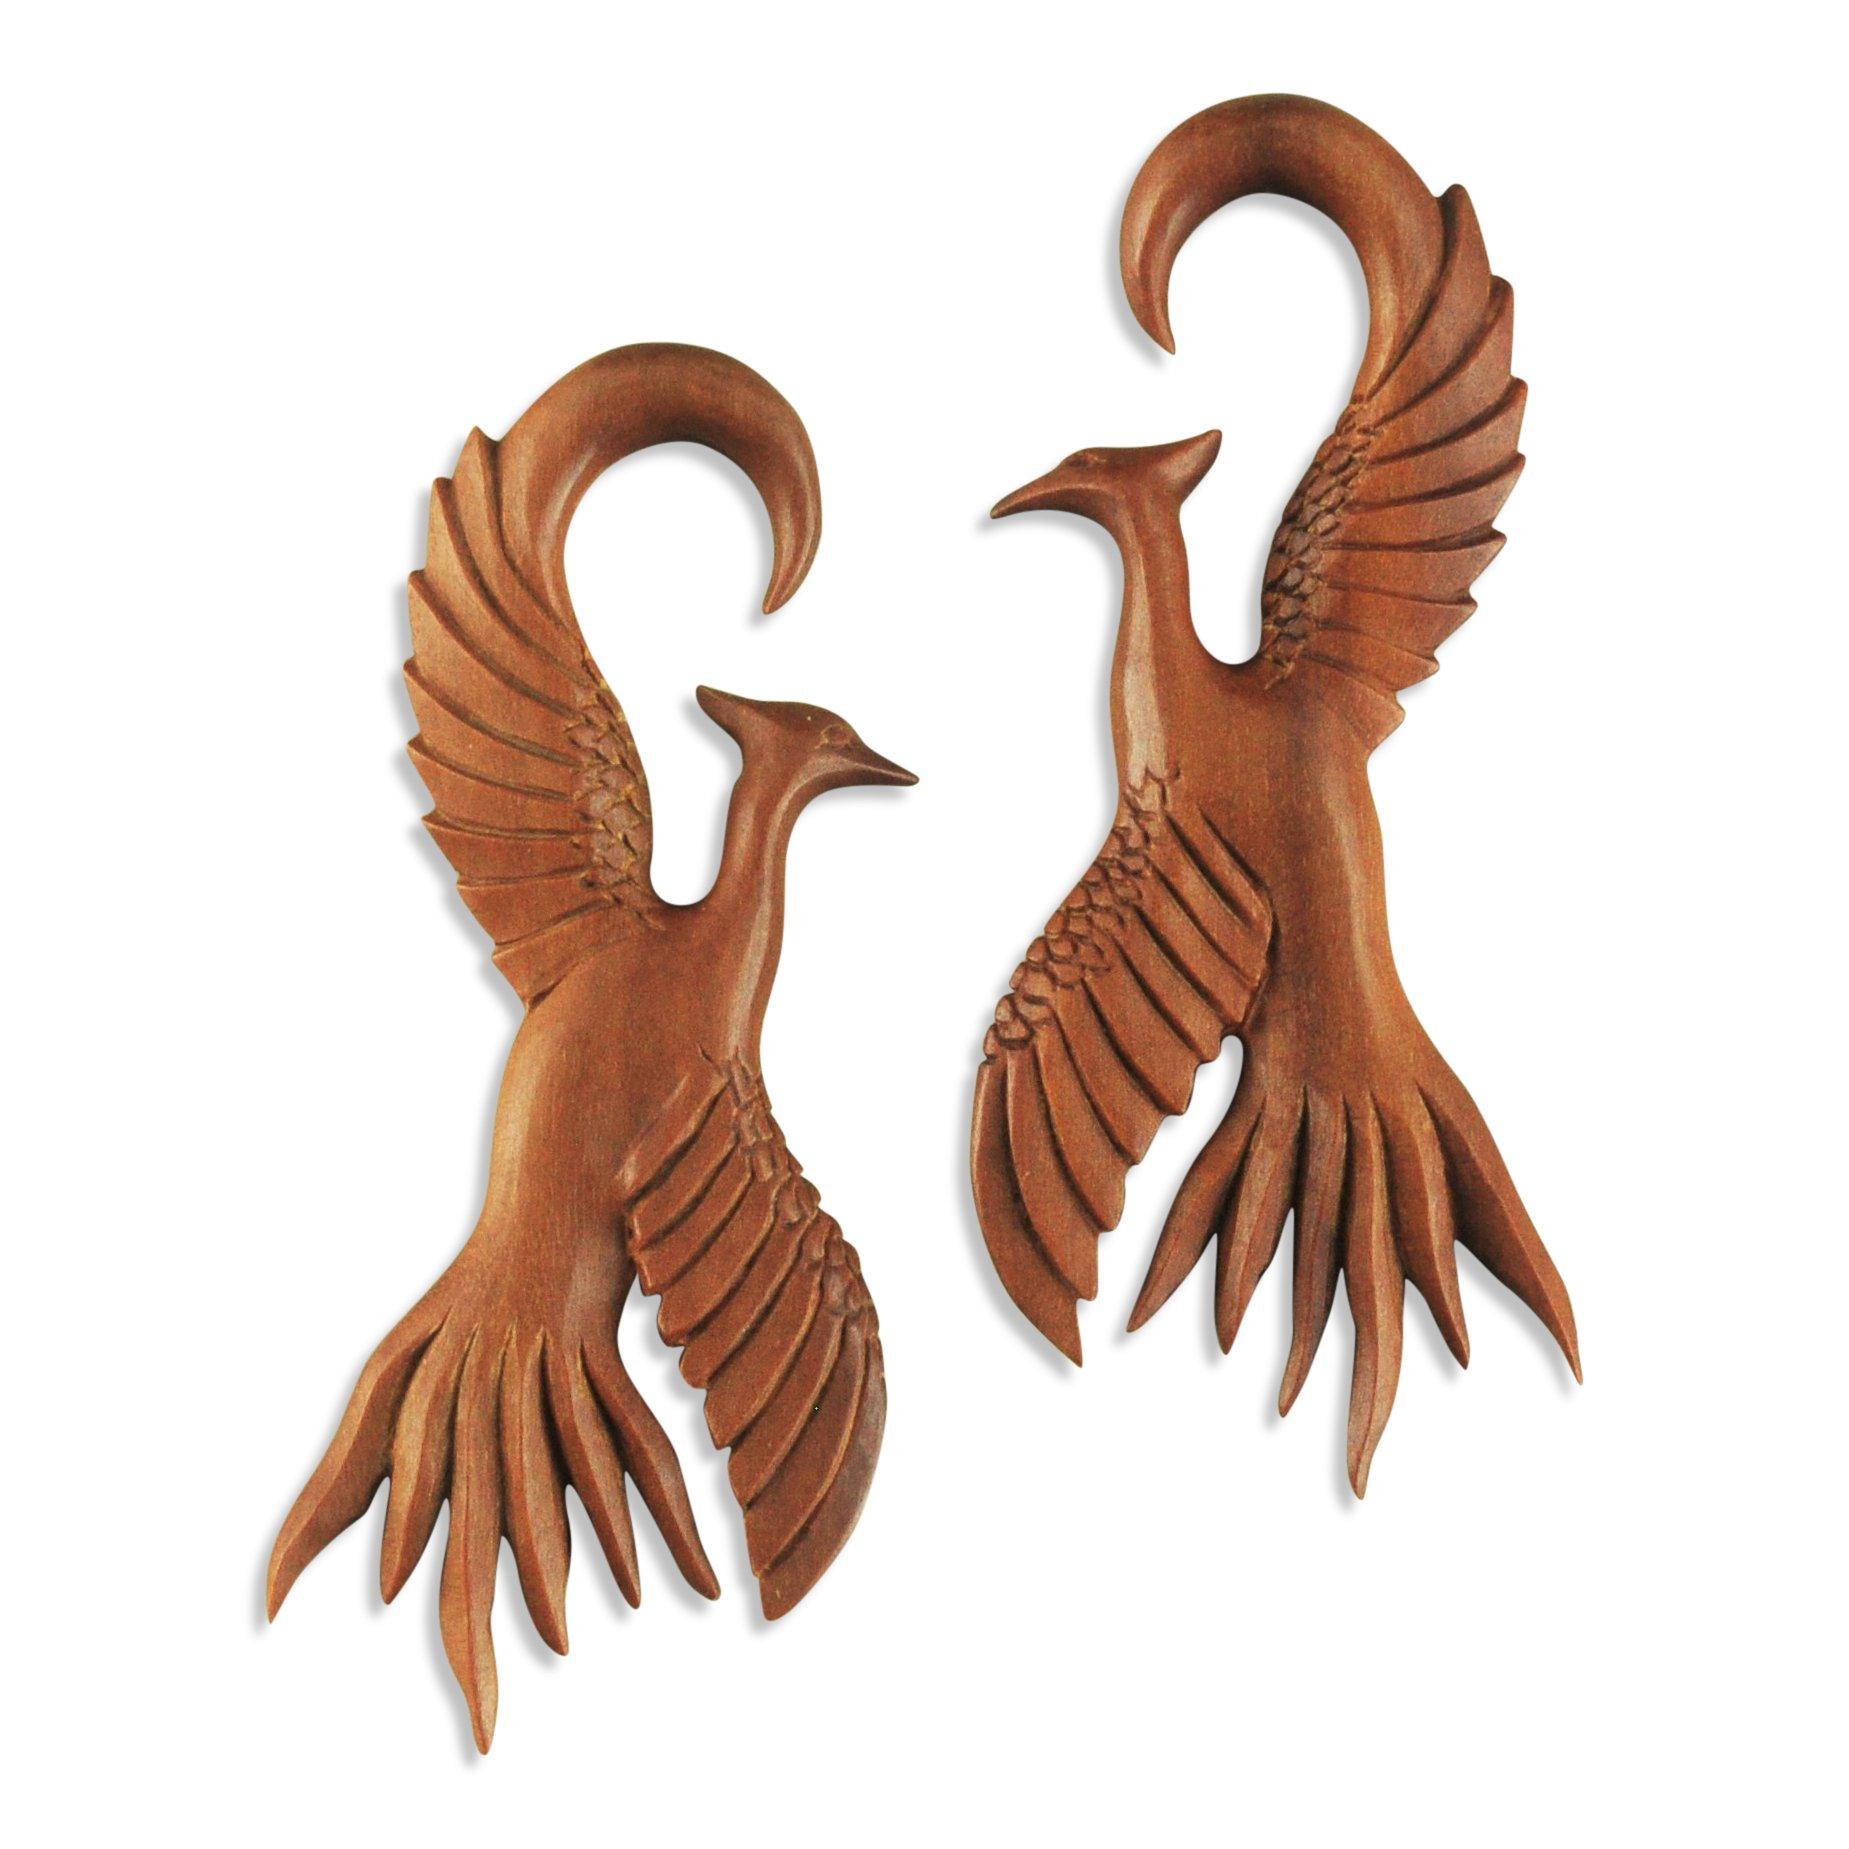 ArcticBuffalo Sawo Wood Bird Hangers Ear Gauges by ArcticBuffalo